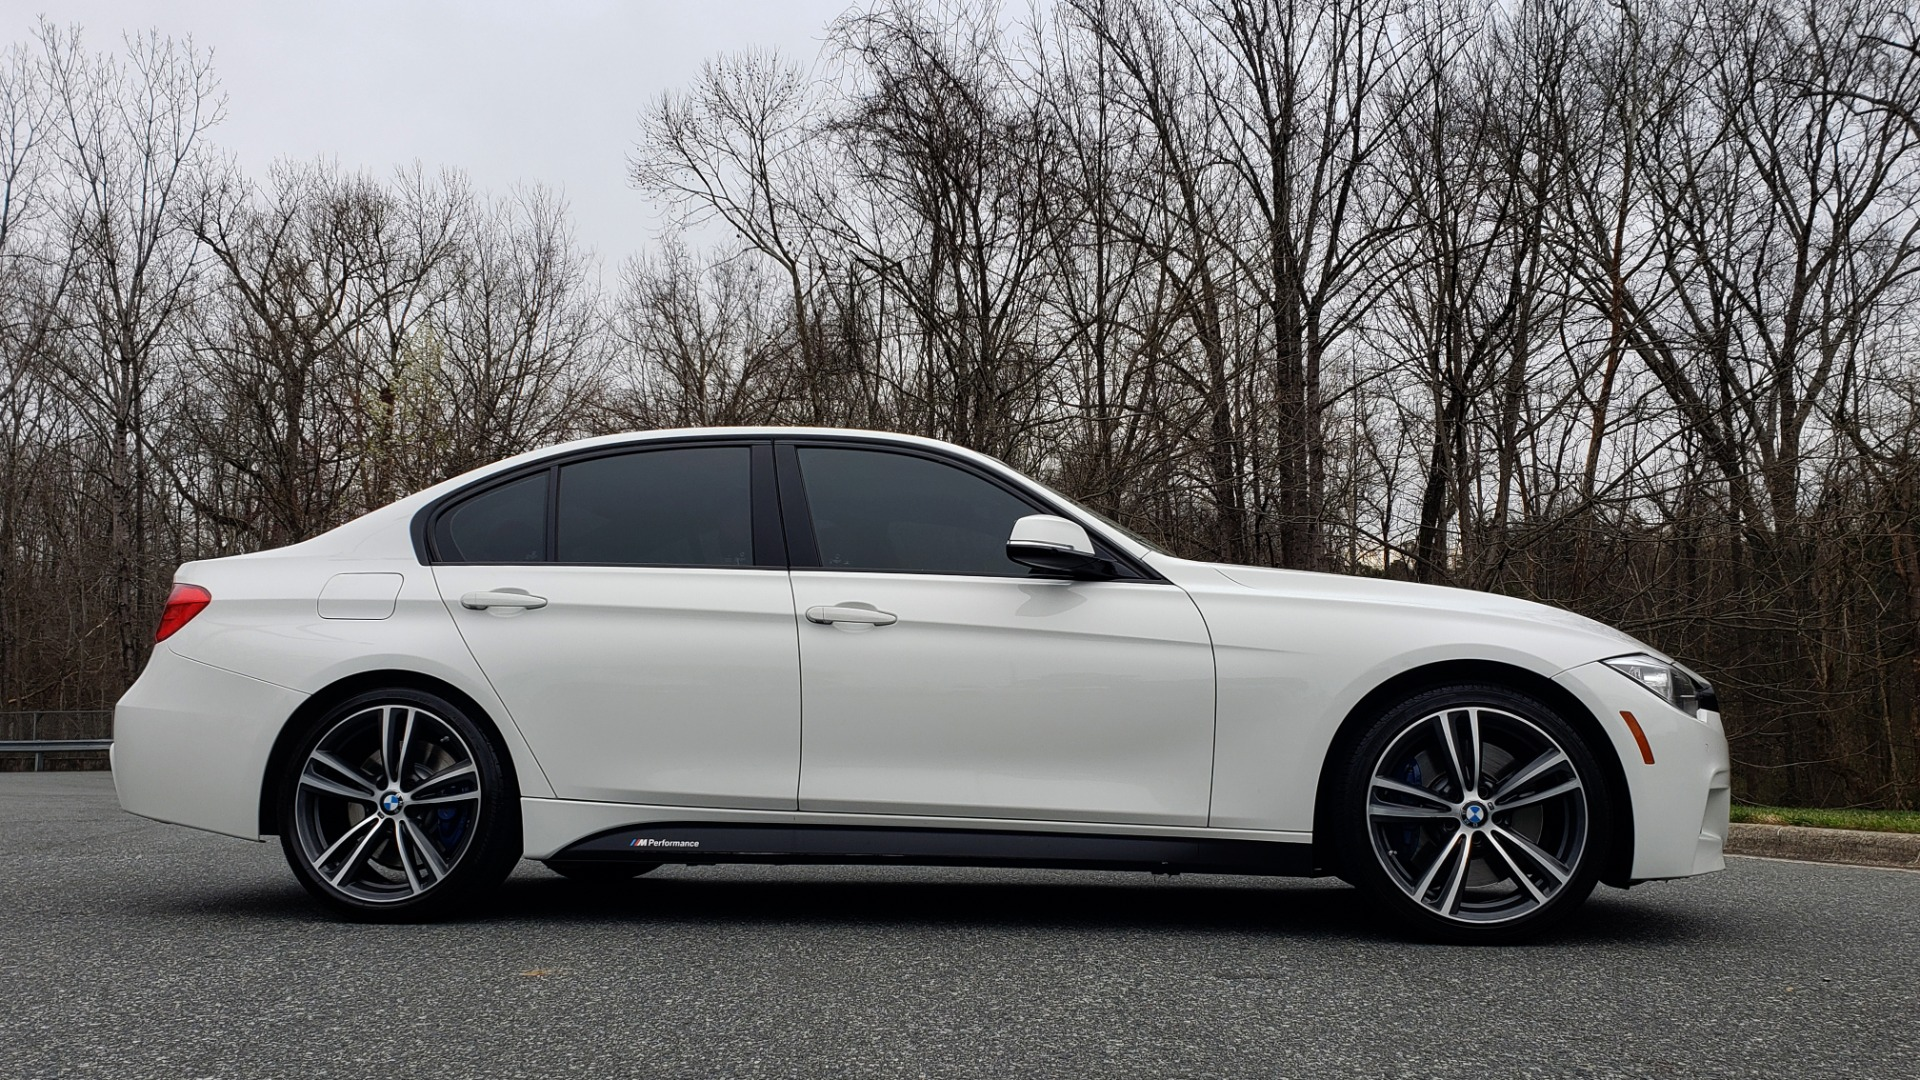 Used 2015 BMW 3 Series 335I M-SPORT / PREM PKG / HK SND / SUNROOF / REARVIEW for sale Sold at Formula Imports in Charlotte NC 28227 5